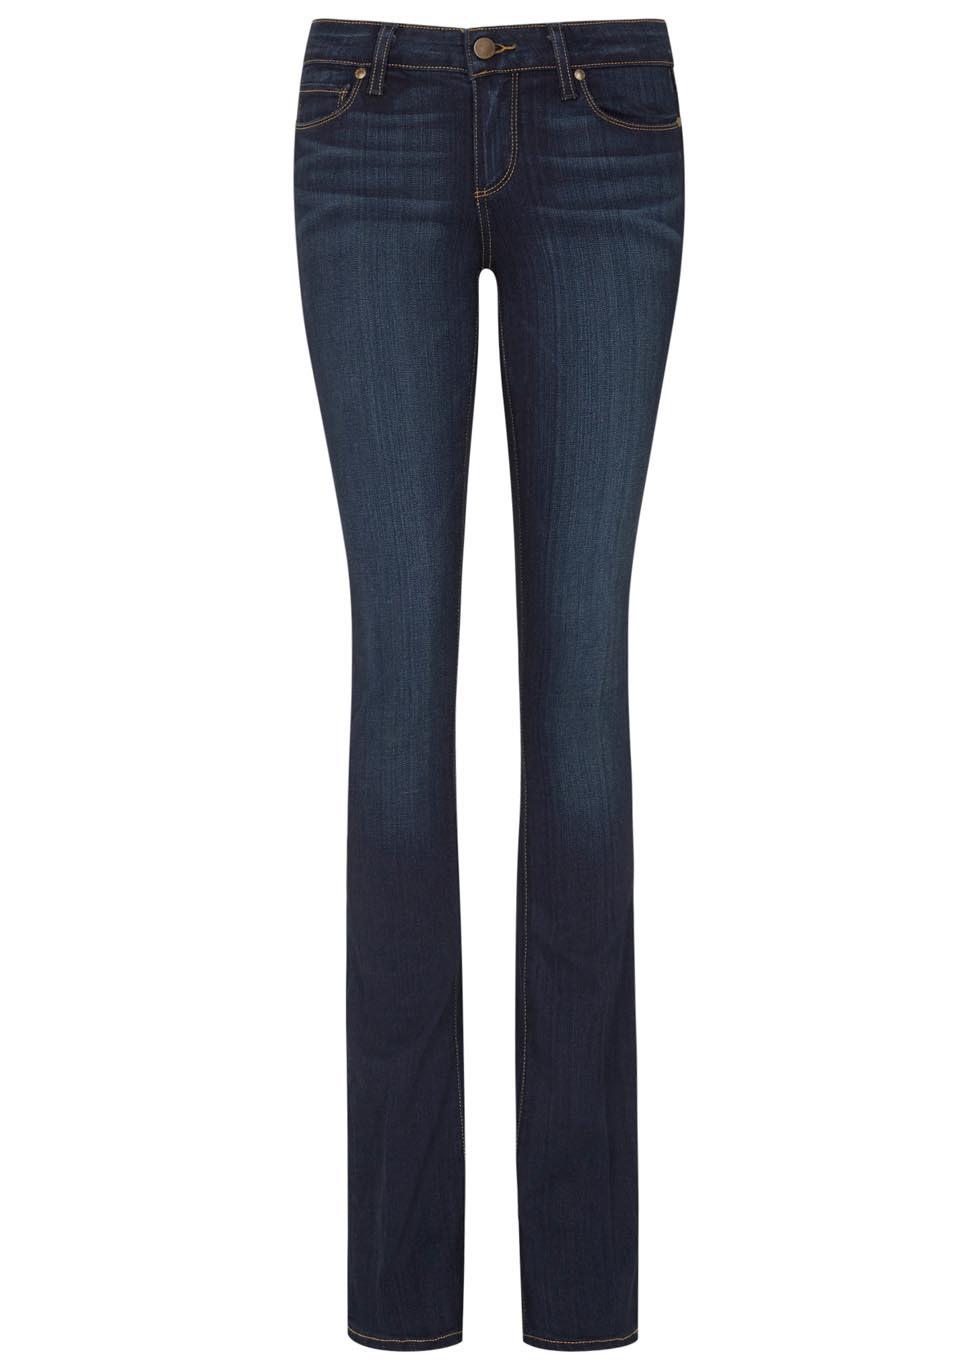 Manhattan Transcend bootcut jeans - Paige